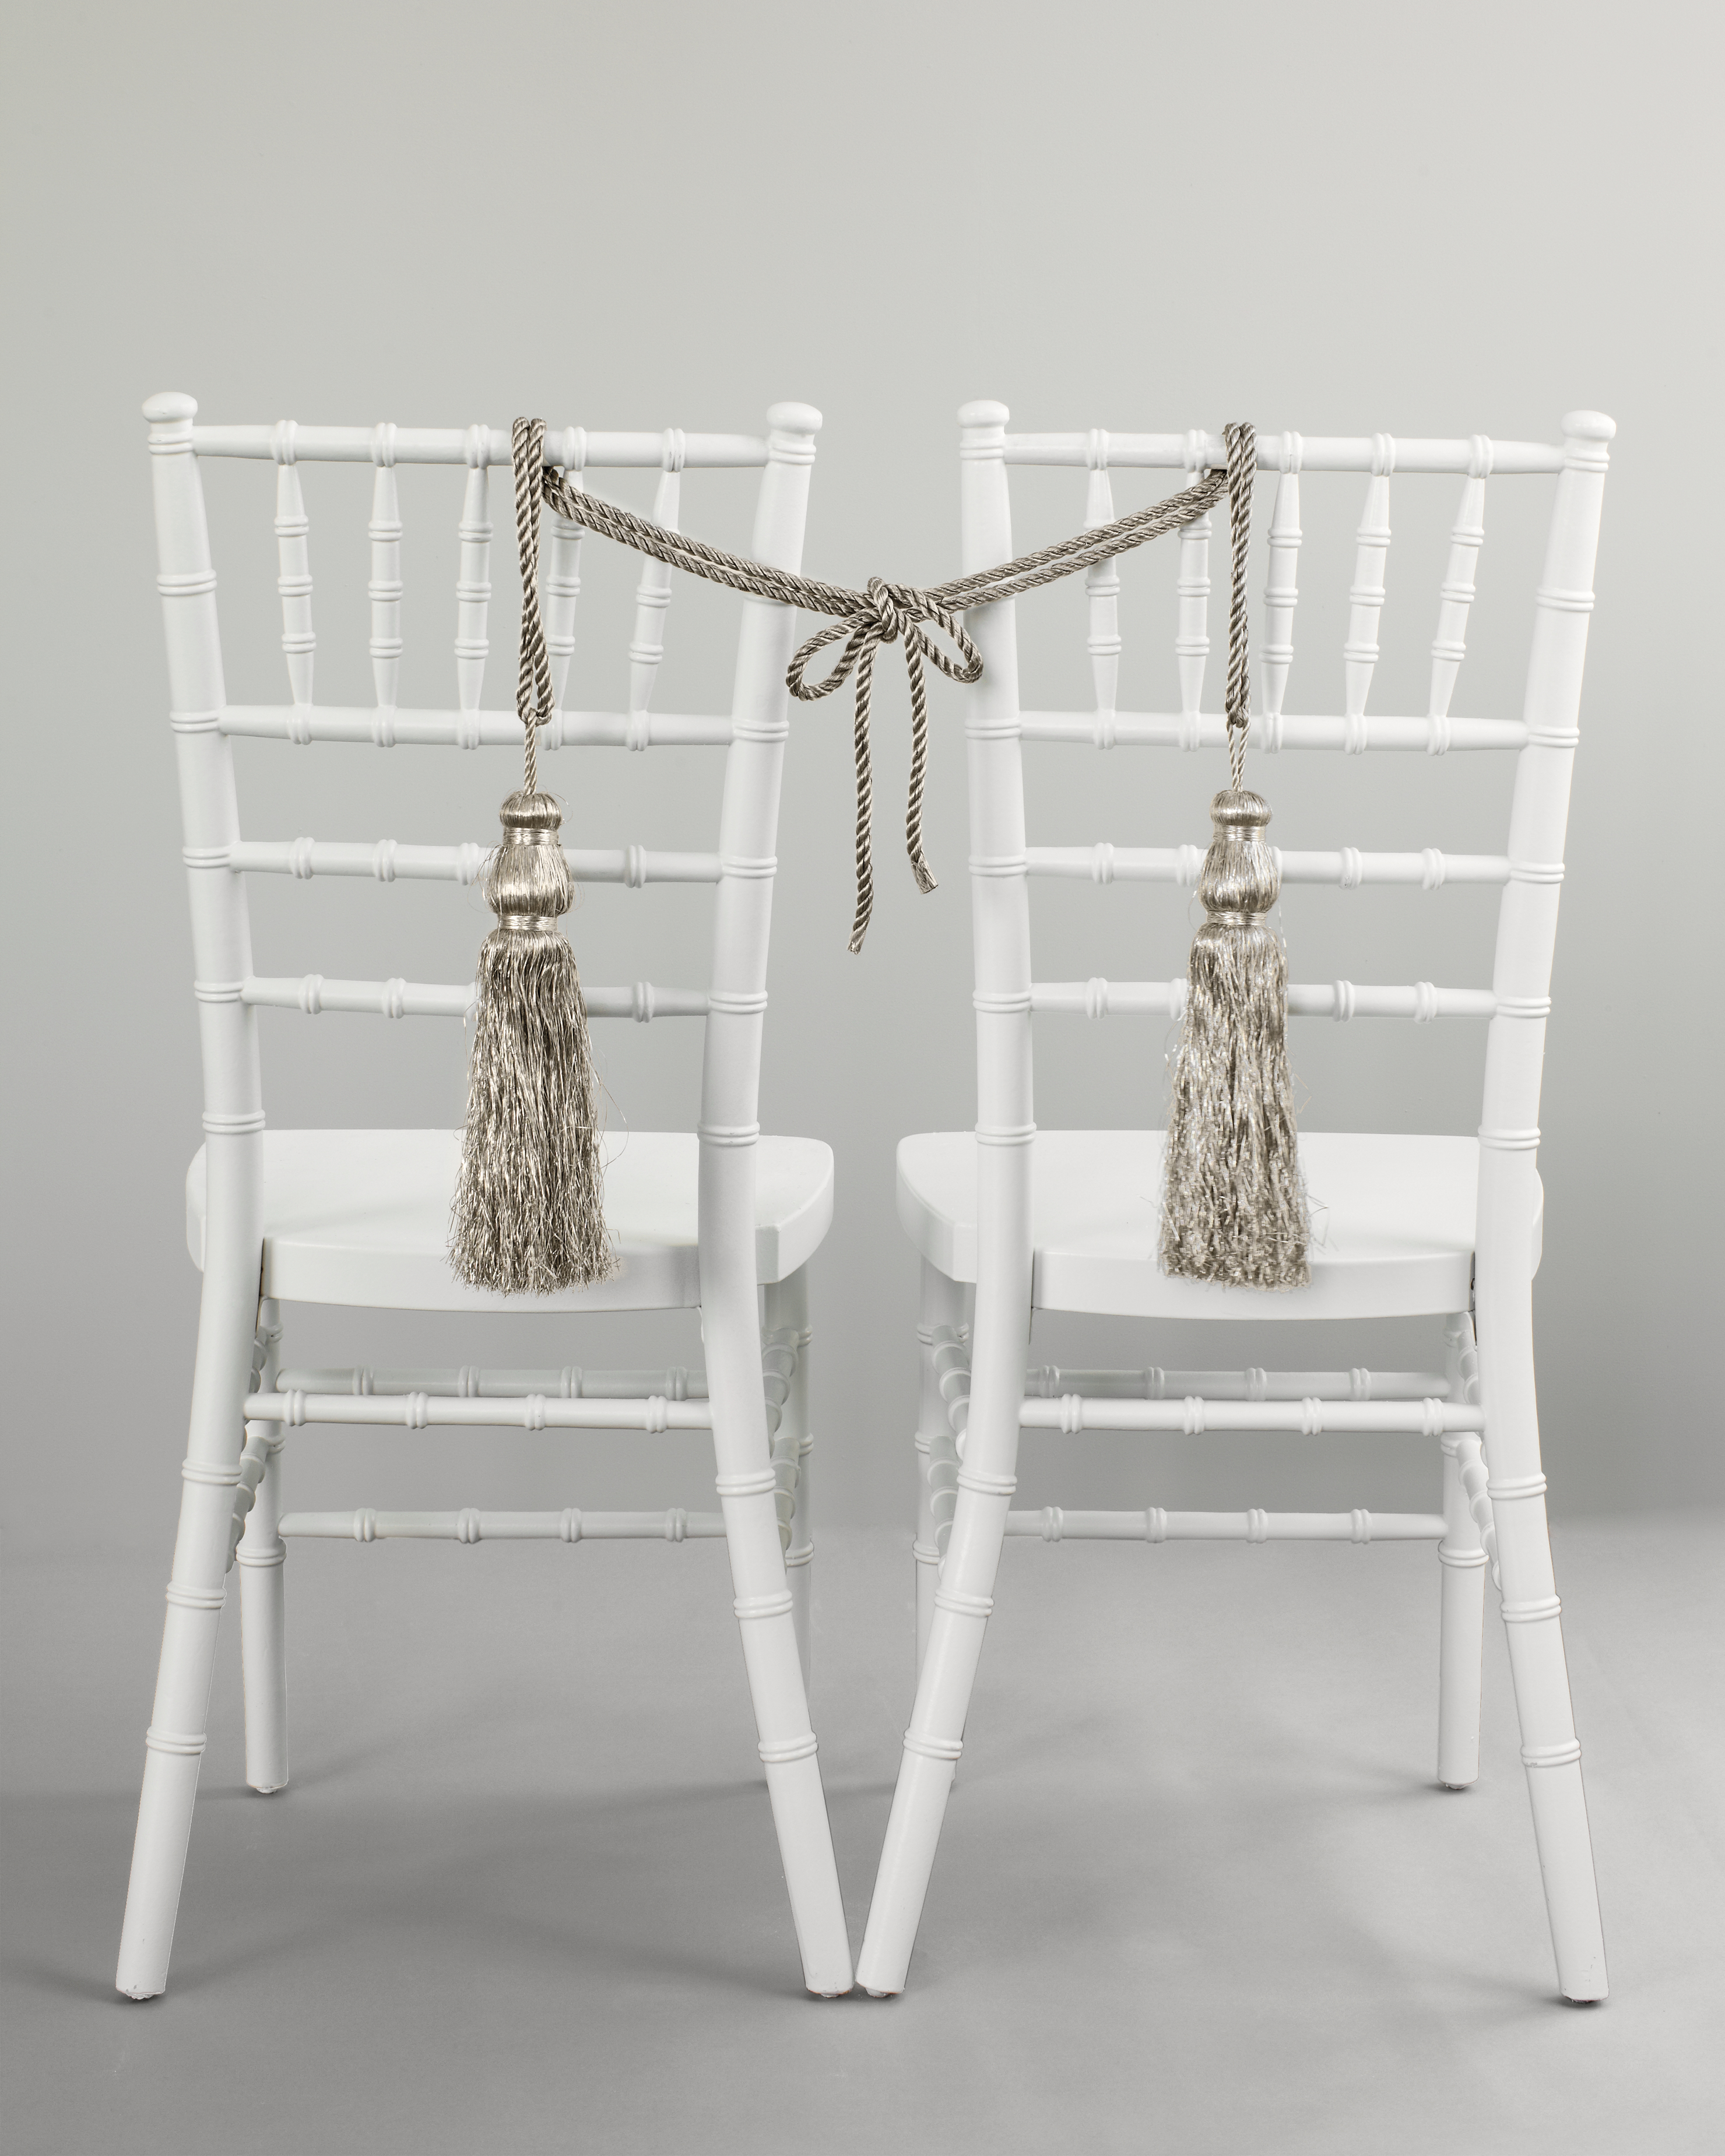 tassel-chairs-224-mwd110357.jpg